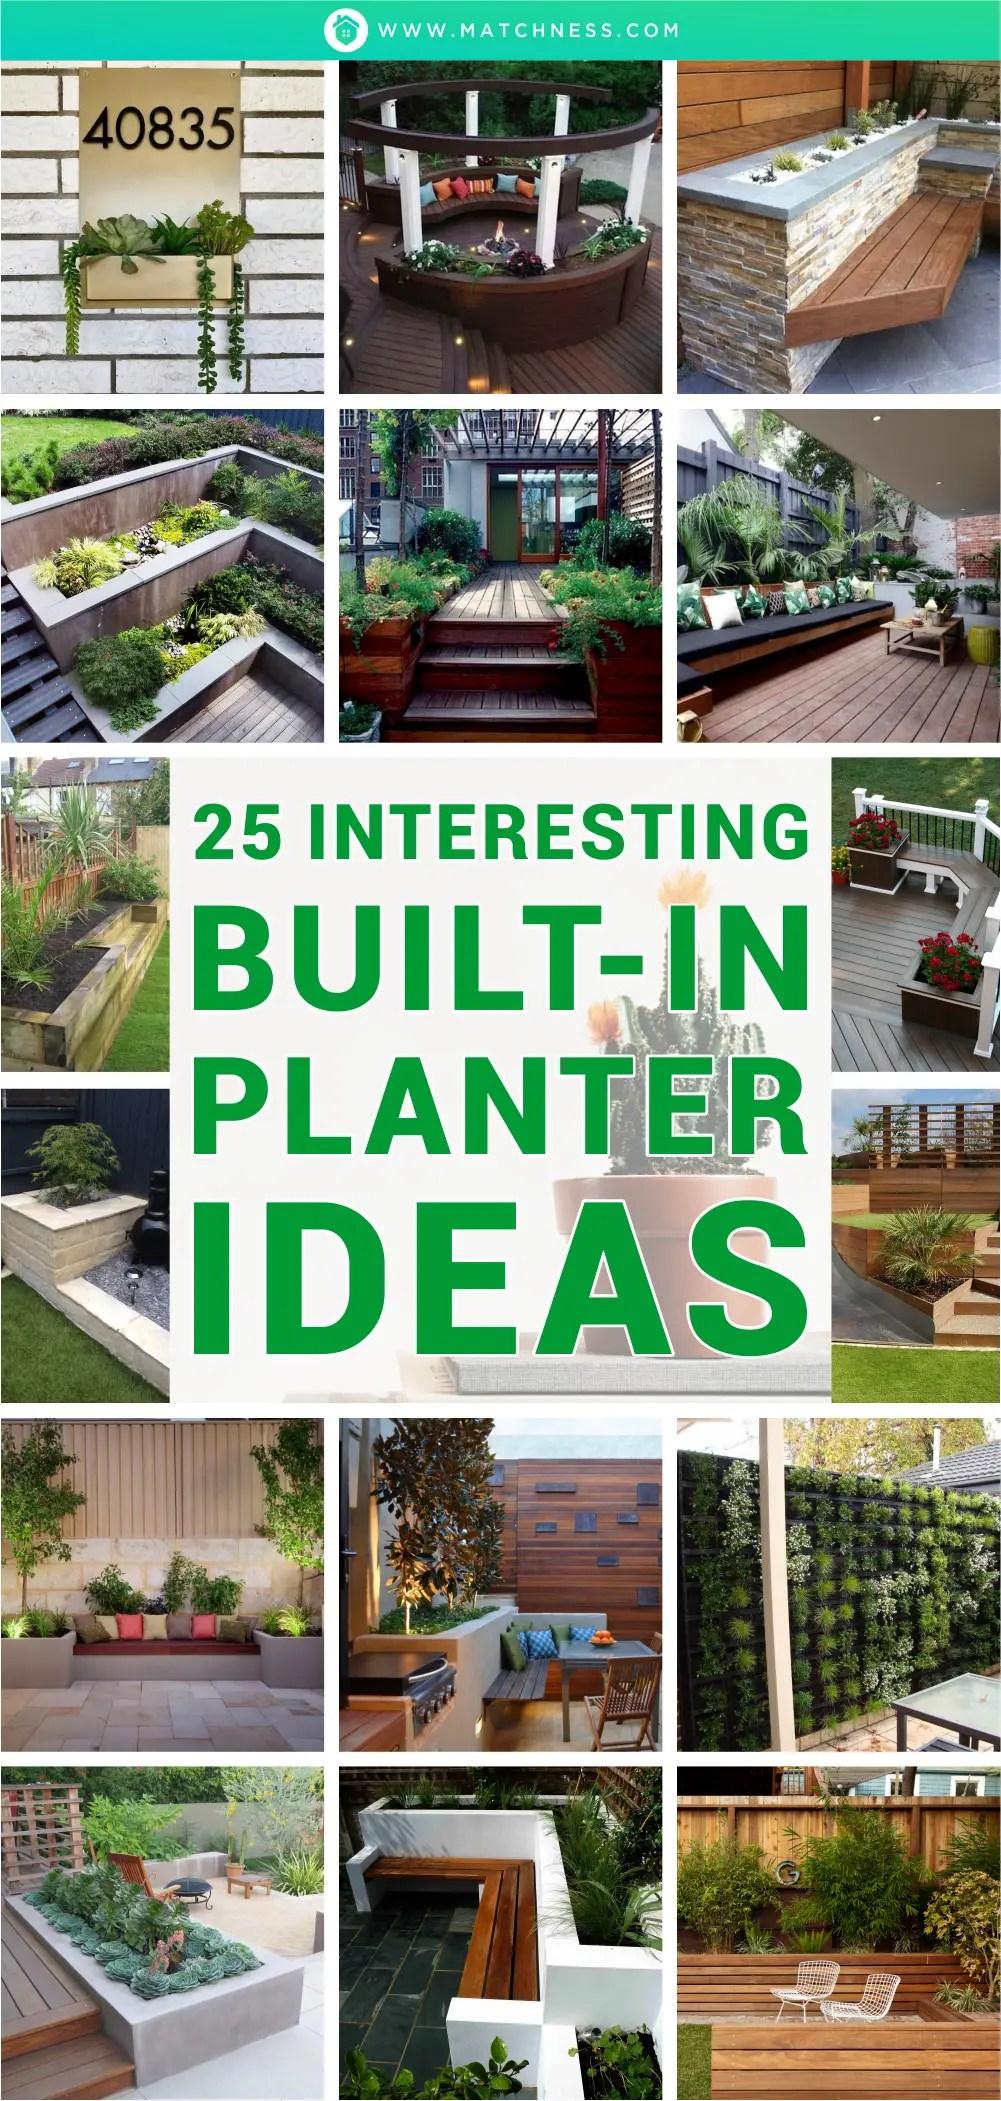 25 interesting built-in planter ideas1